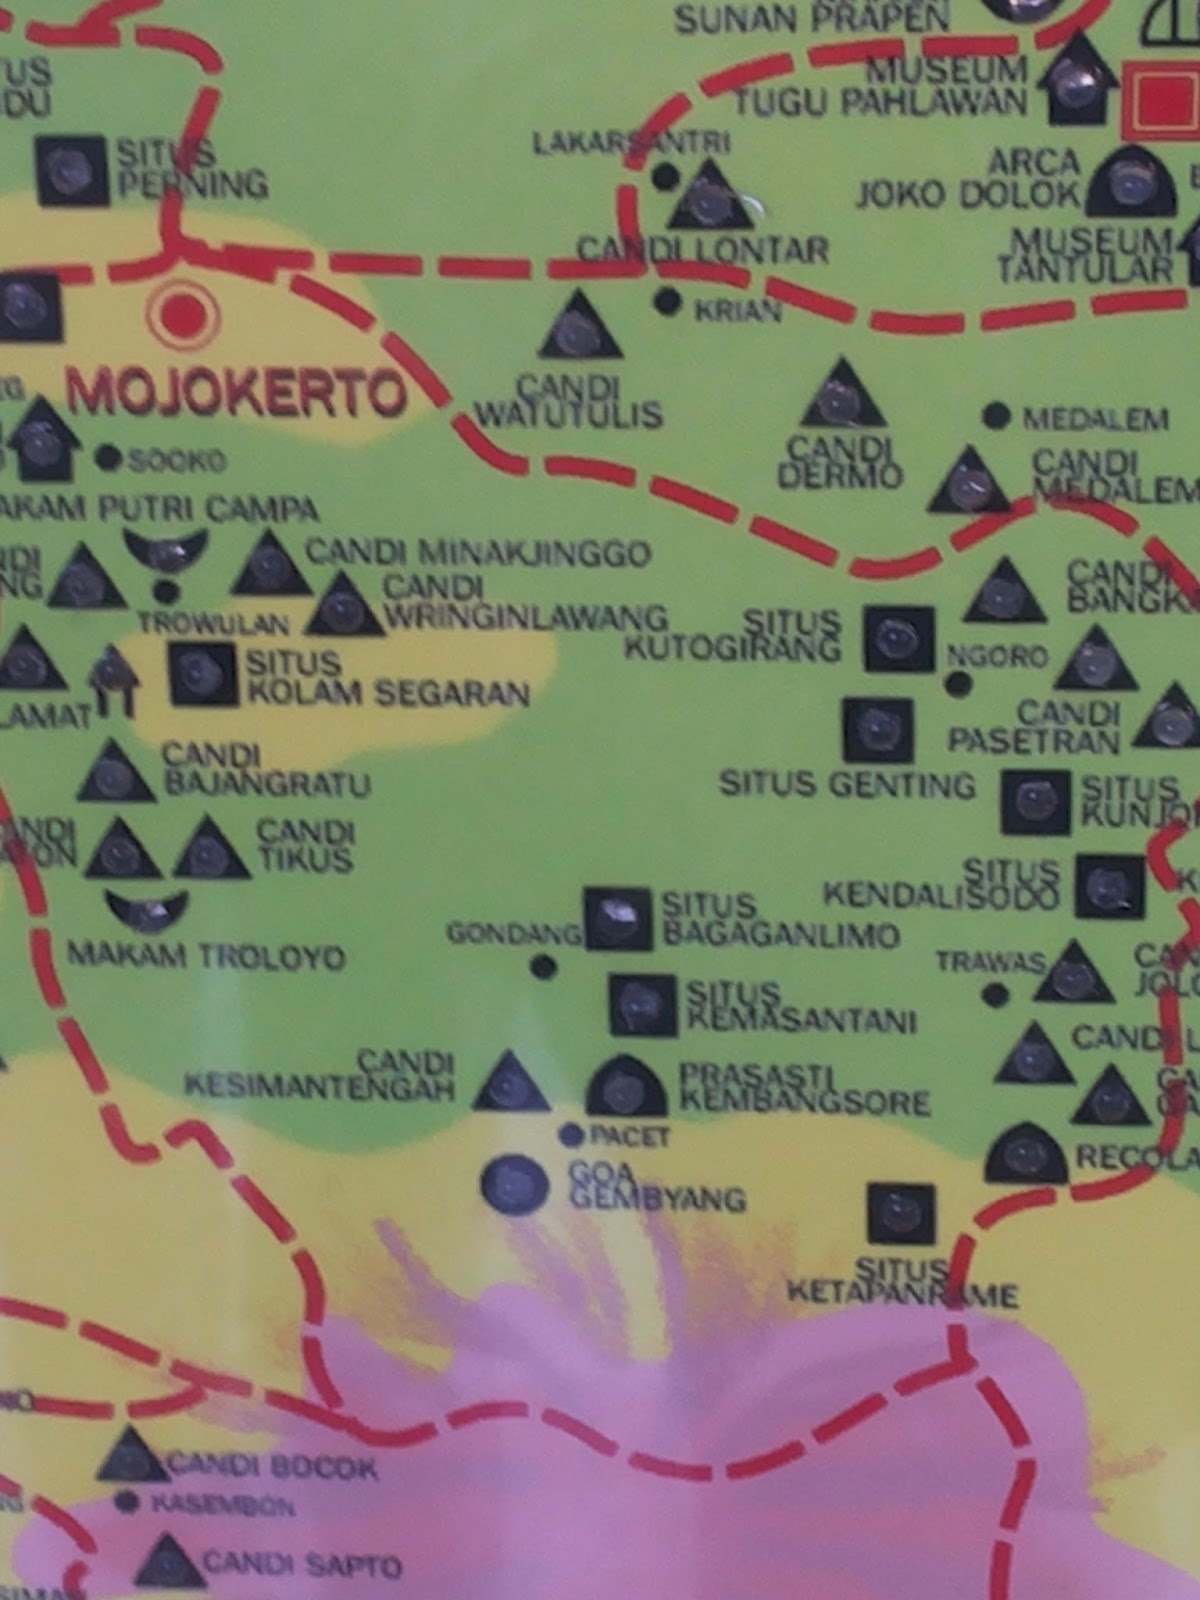 Homeland Tempat Wisata Kotaku Mojokerto Berbagai Situs Candi Peninggalan Purbakala